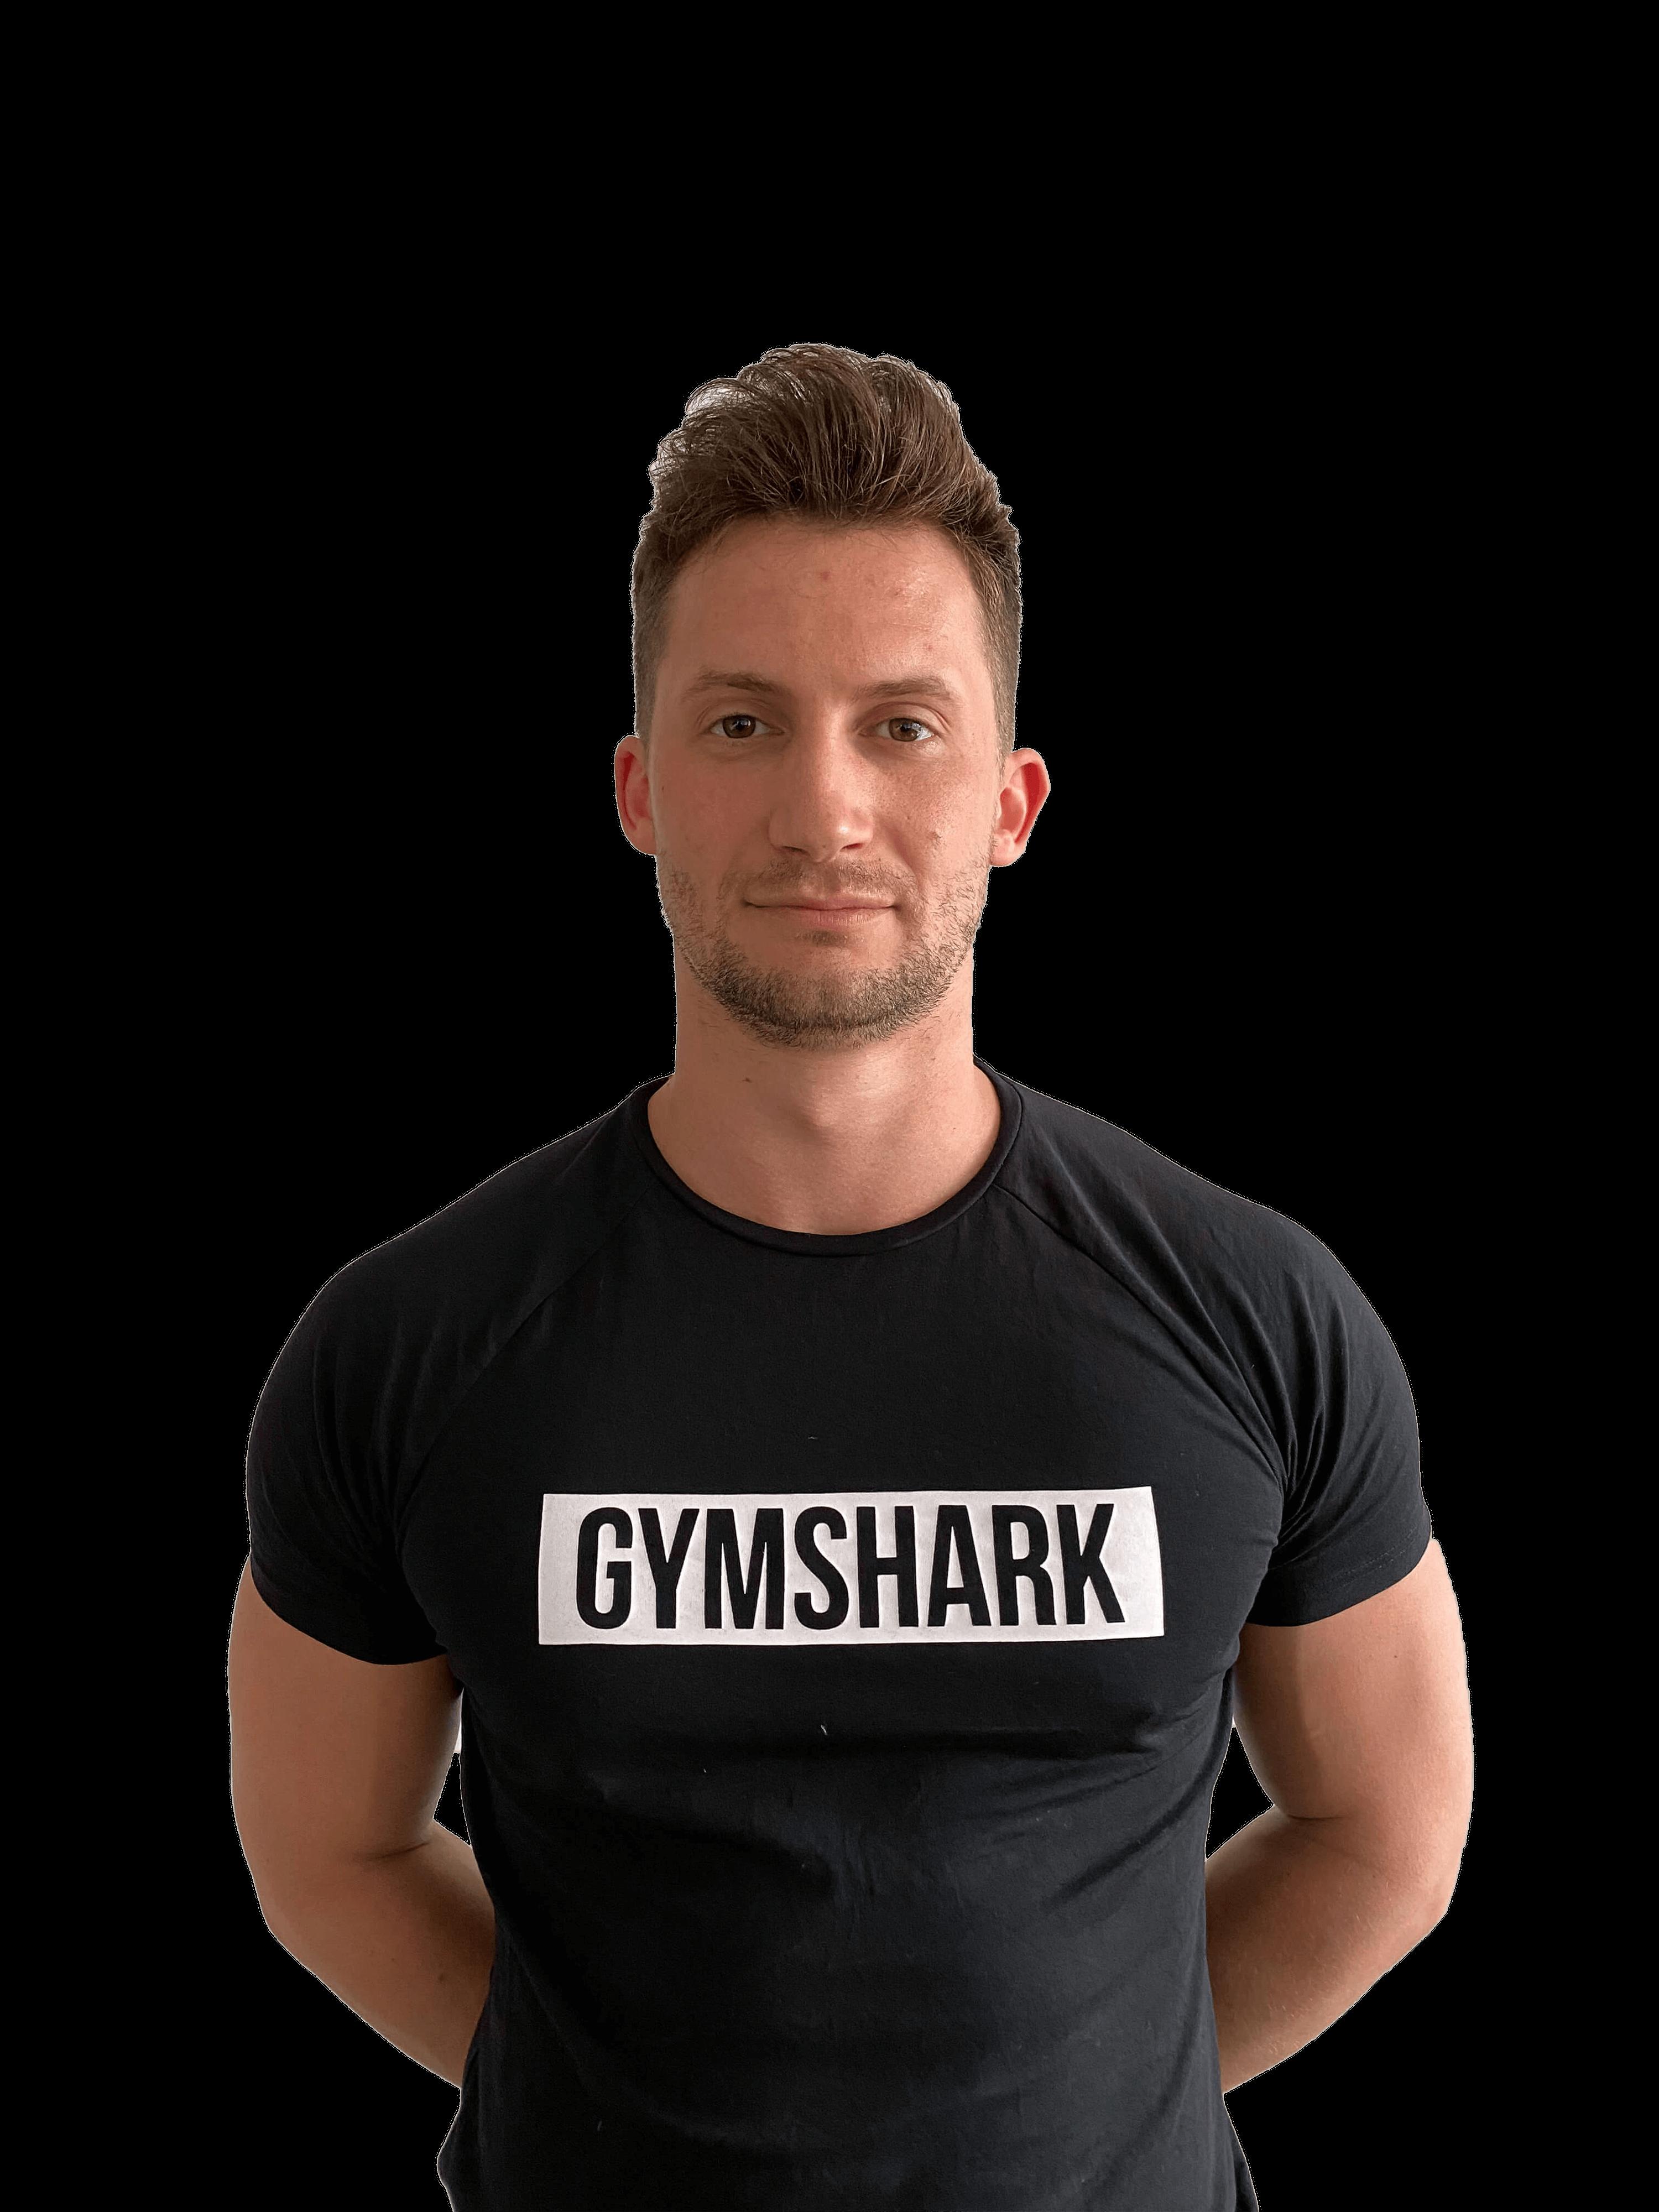 Gymshark Headshot Cutout